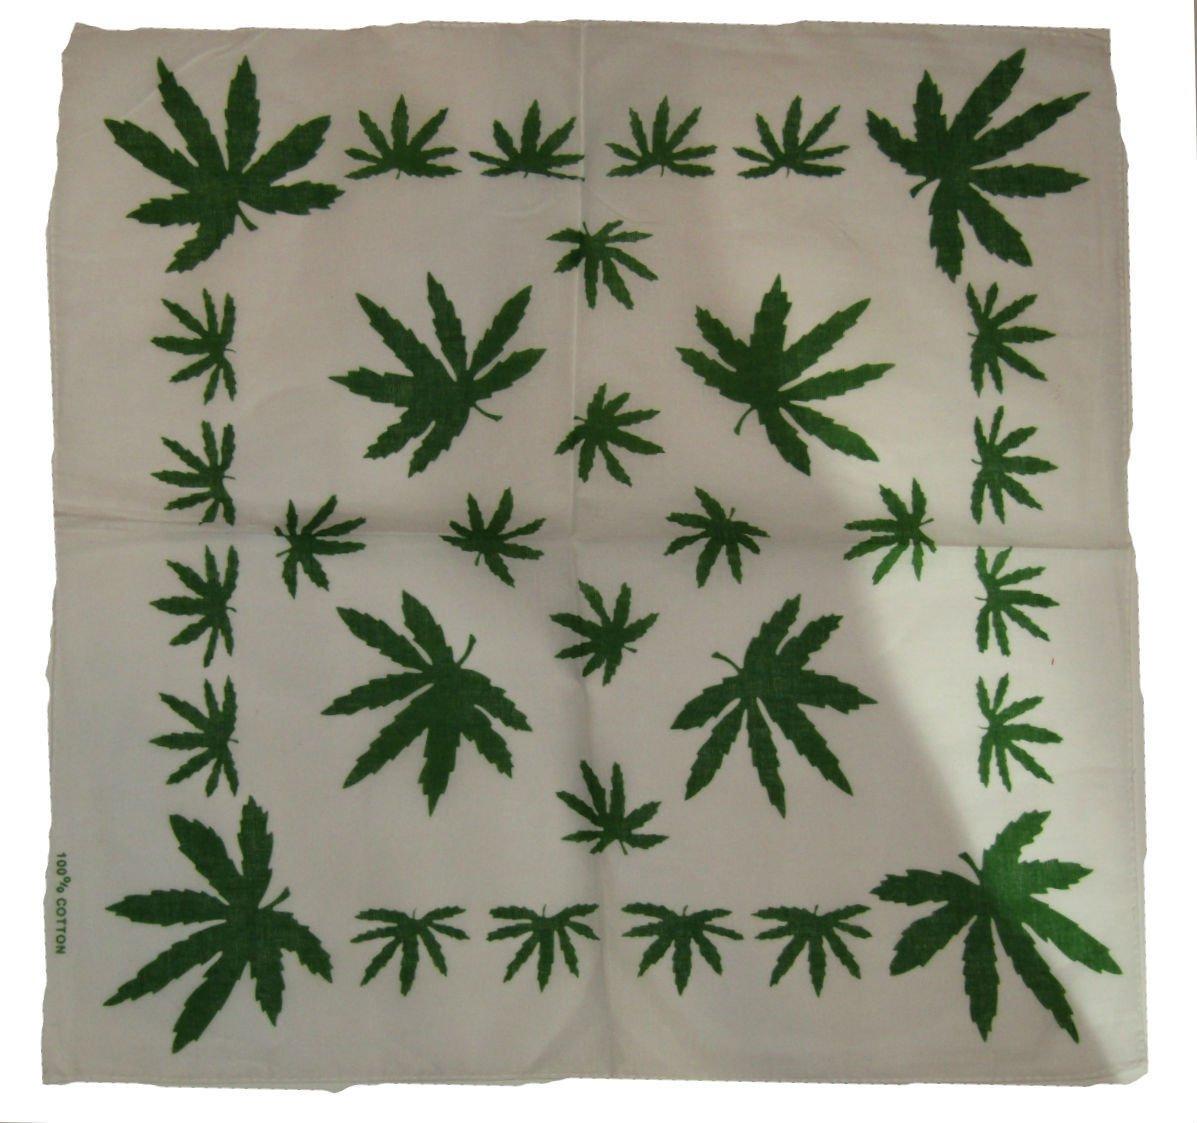 K's Novelties 22″x22″ White Weed Hemp Marijuana Refer Leaf Border Bandanna